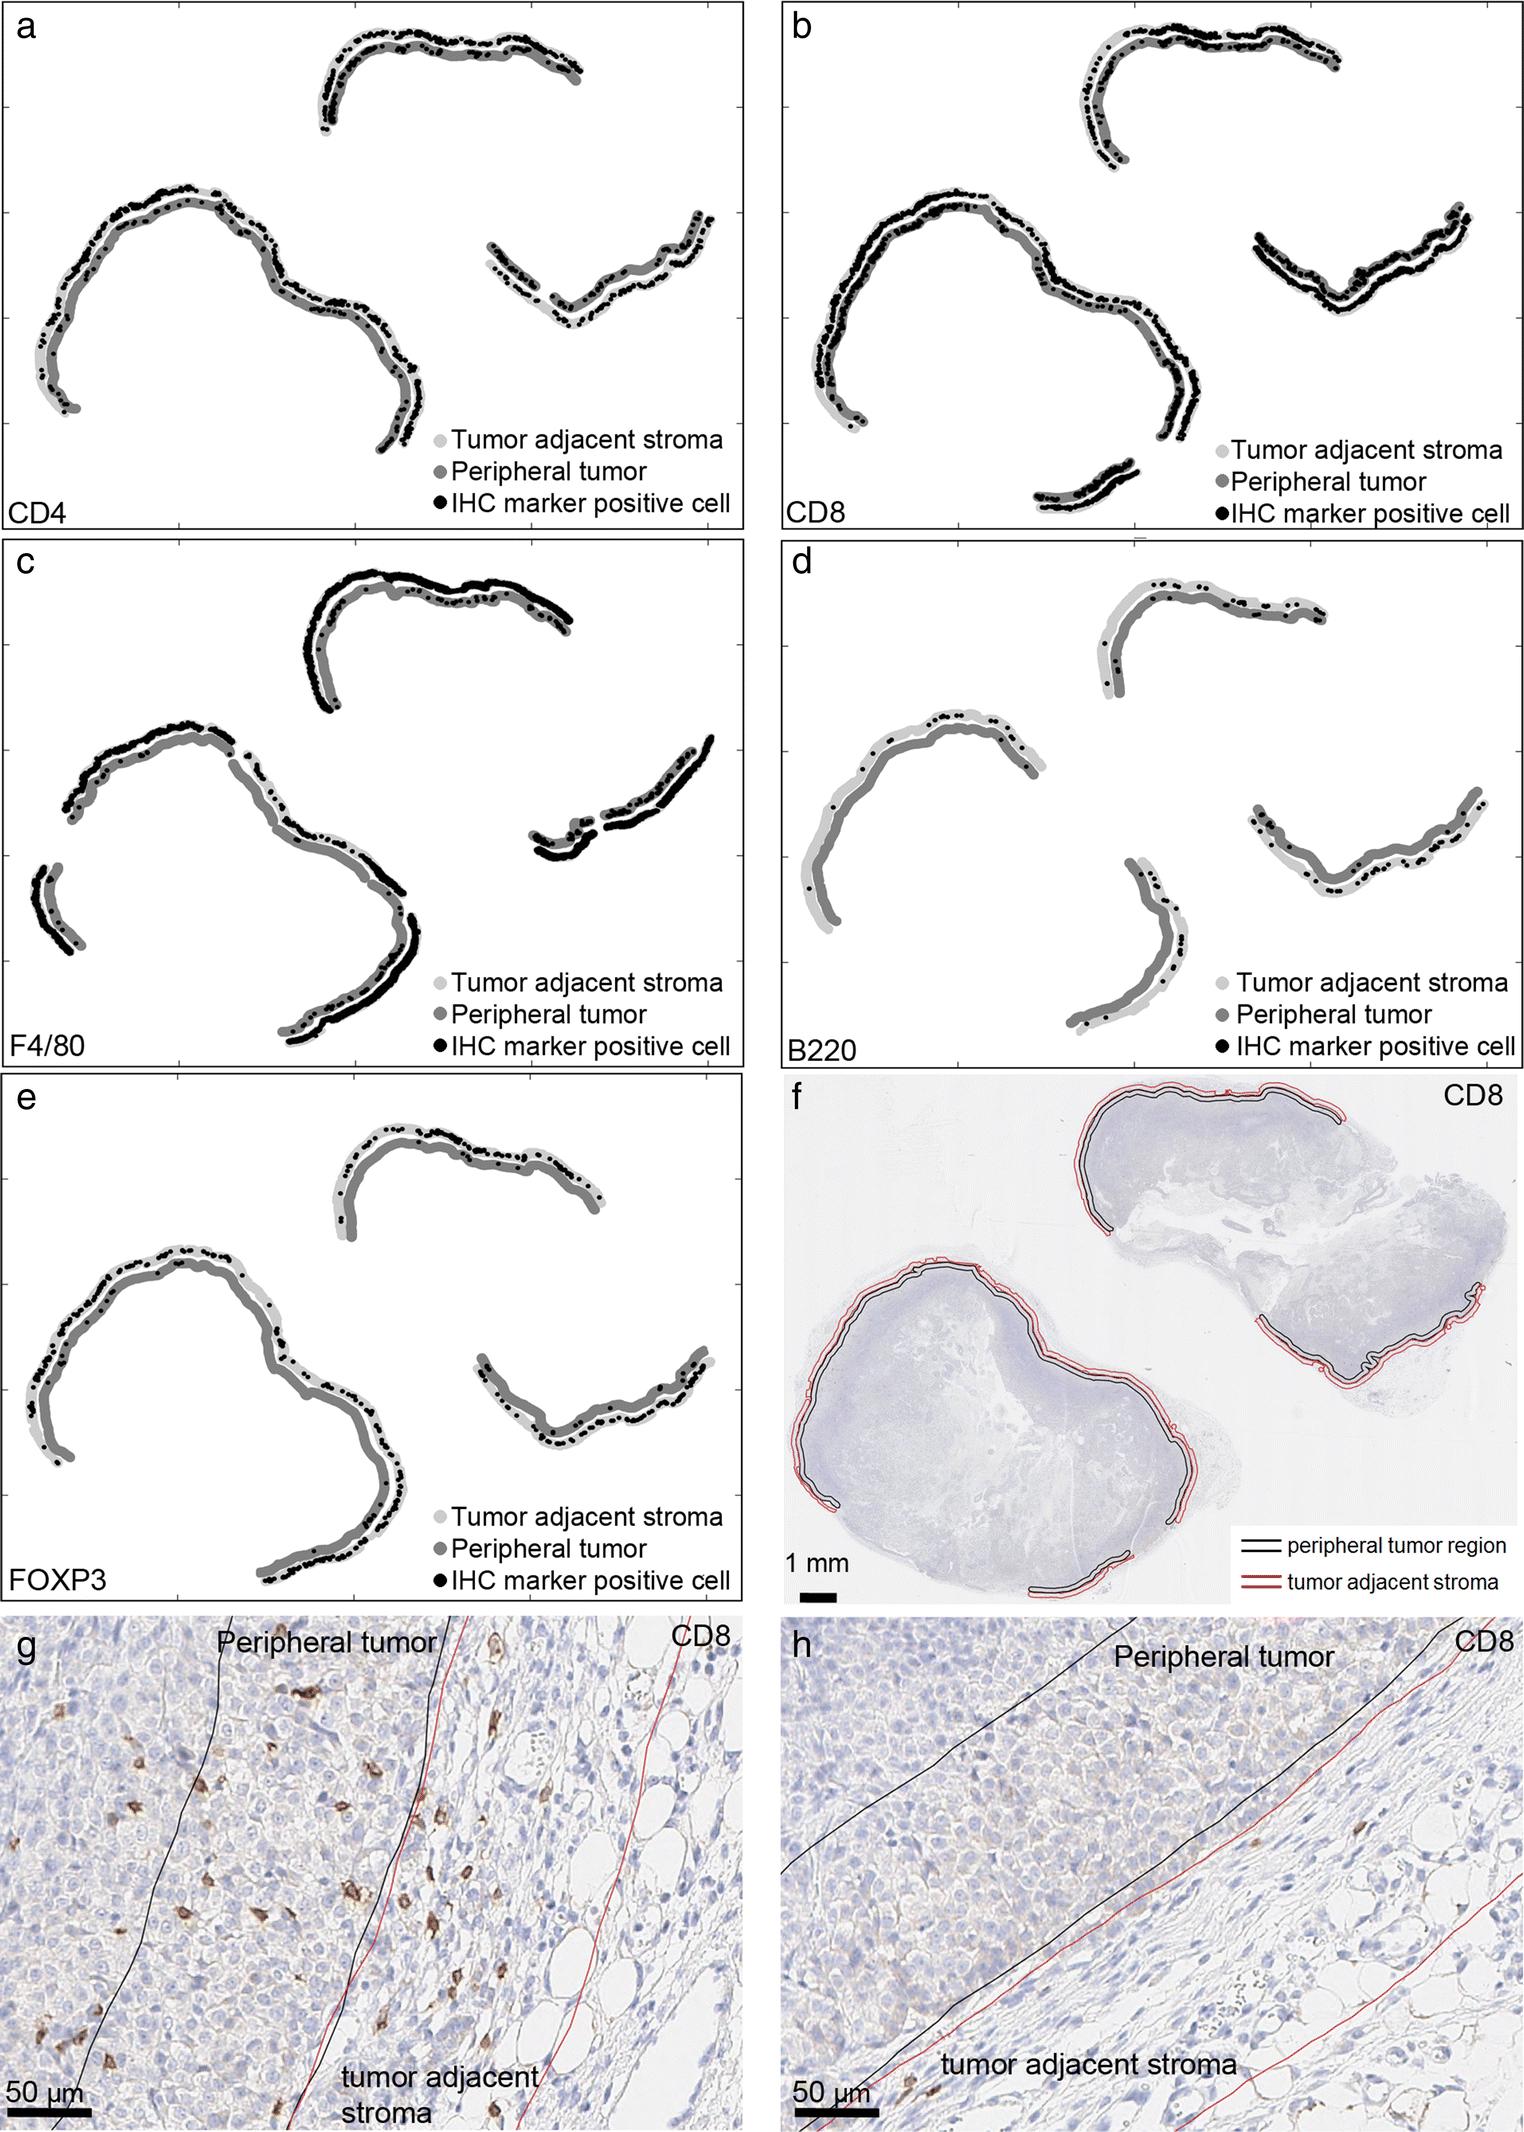 A Syngeneic ErbB2 Mammary Cancer Model for Preclinical